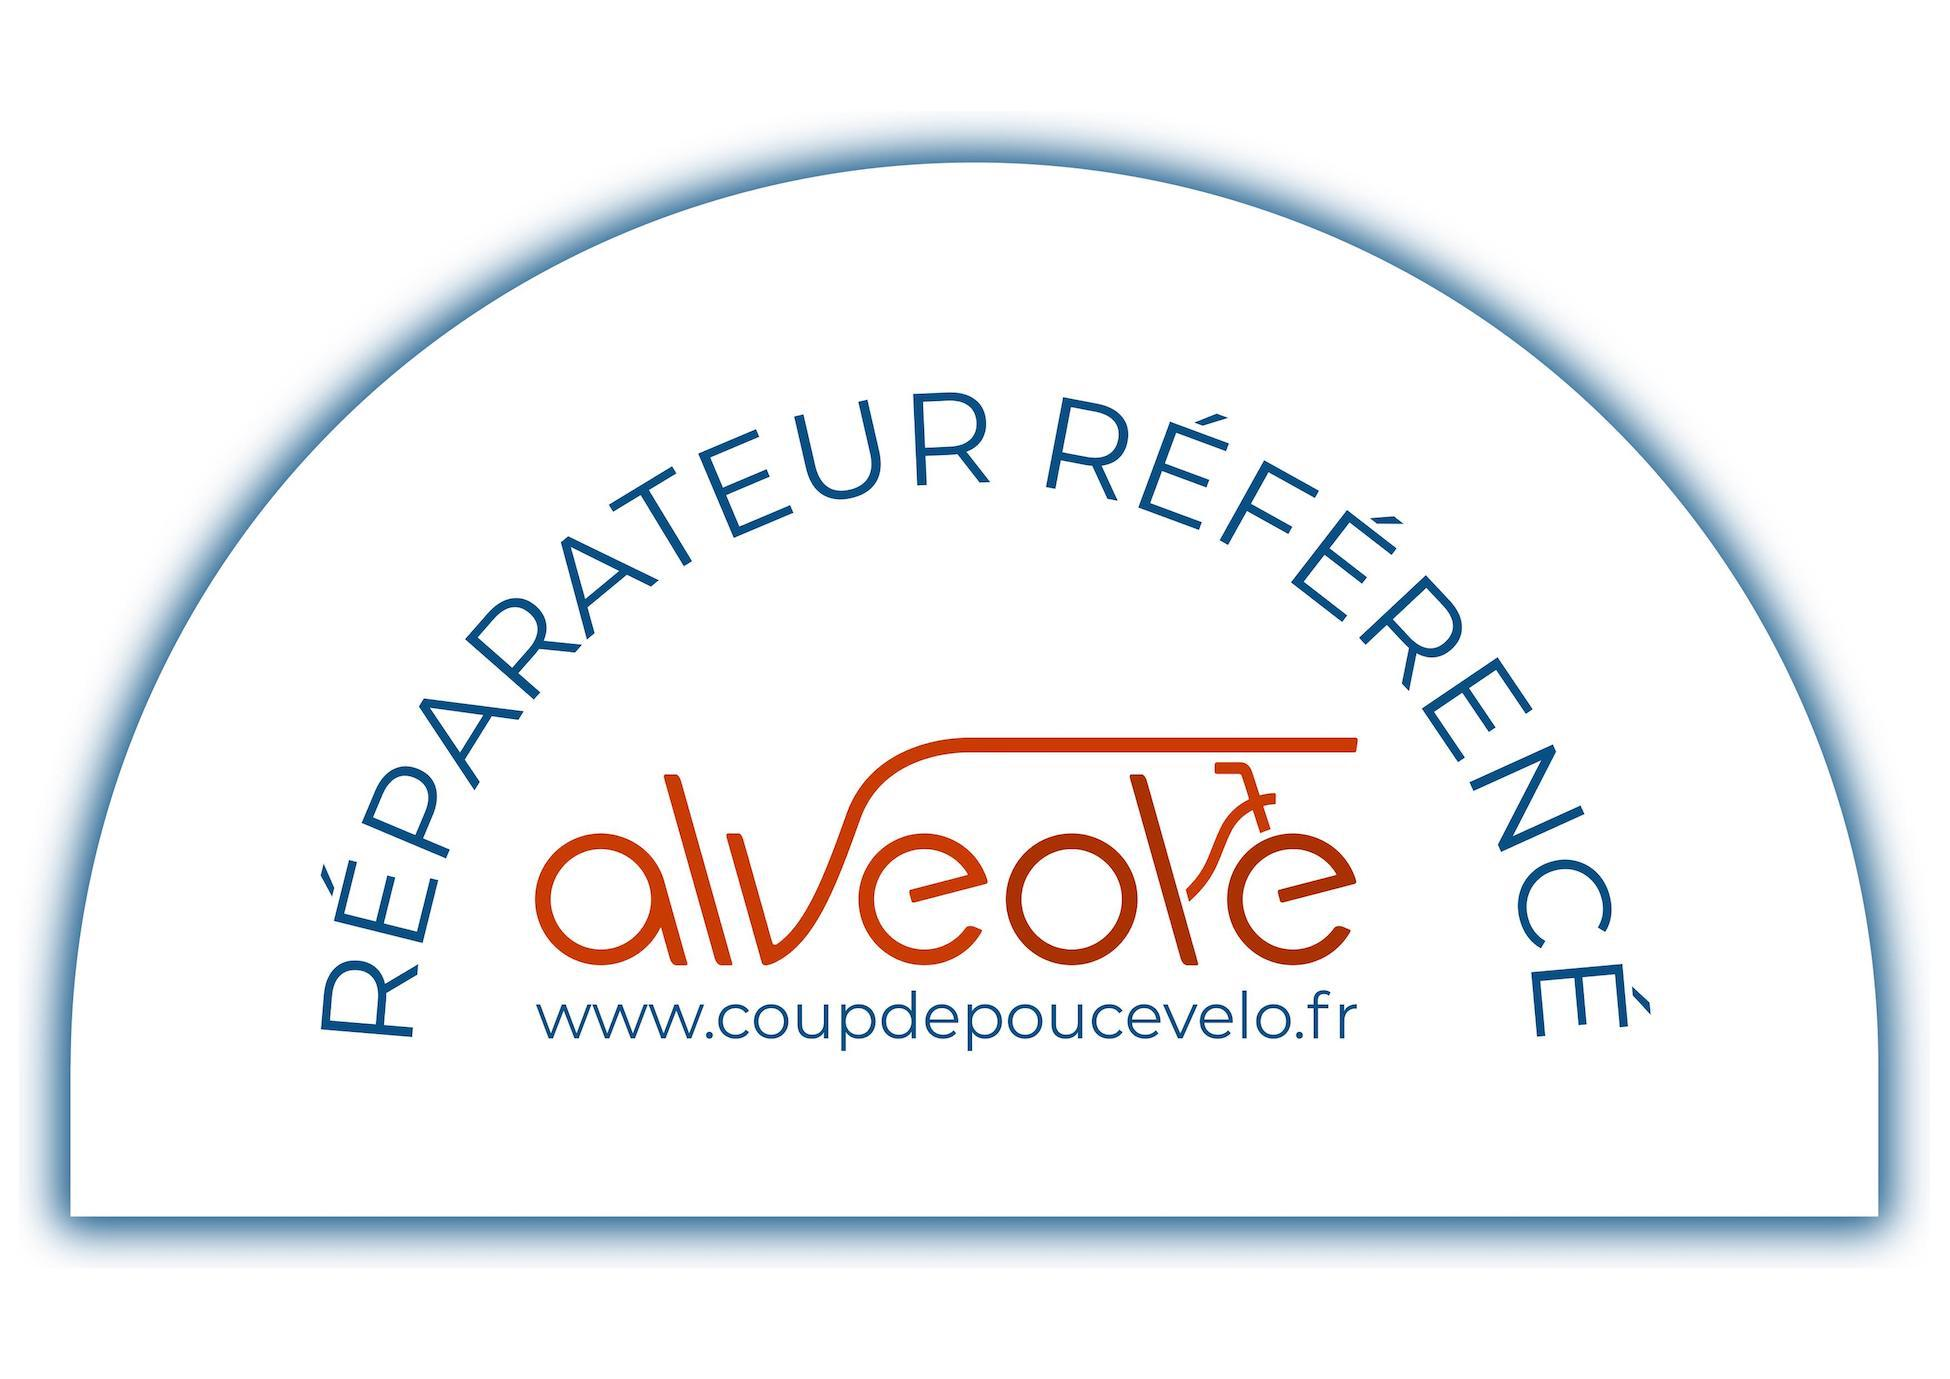 reparateur-velo-vtt-vtc-pays-basque-domicile-reparation-revision-ecole-babike-anglet-bayonne-64